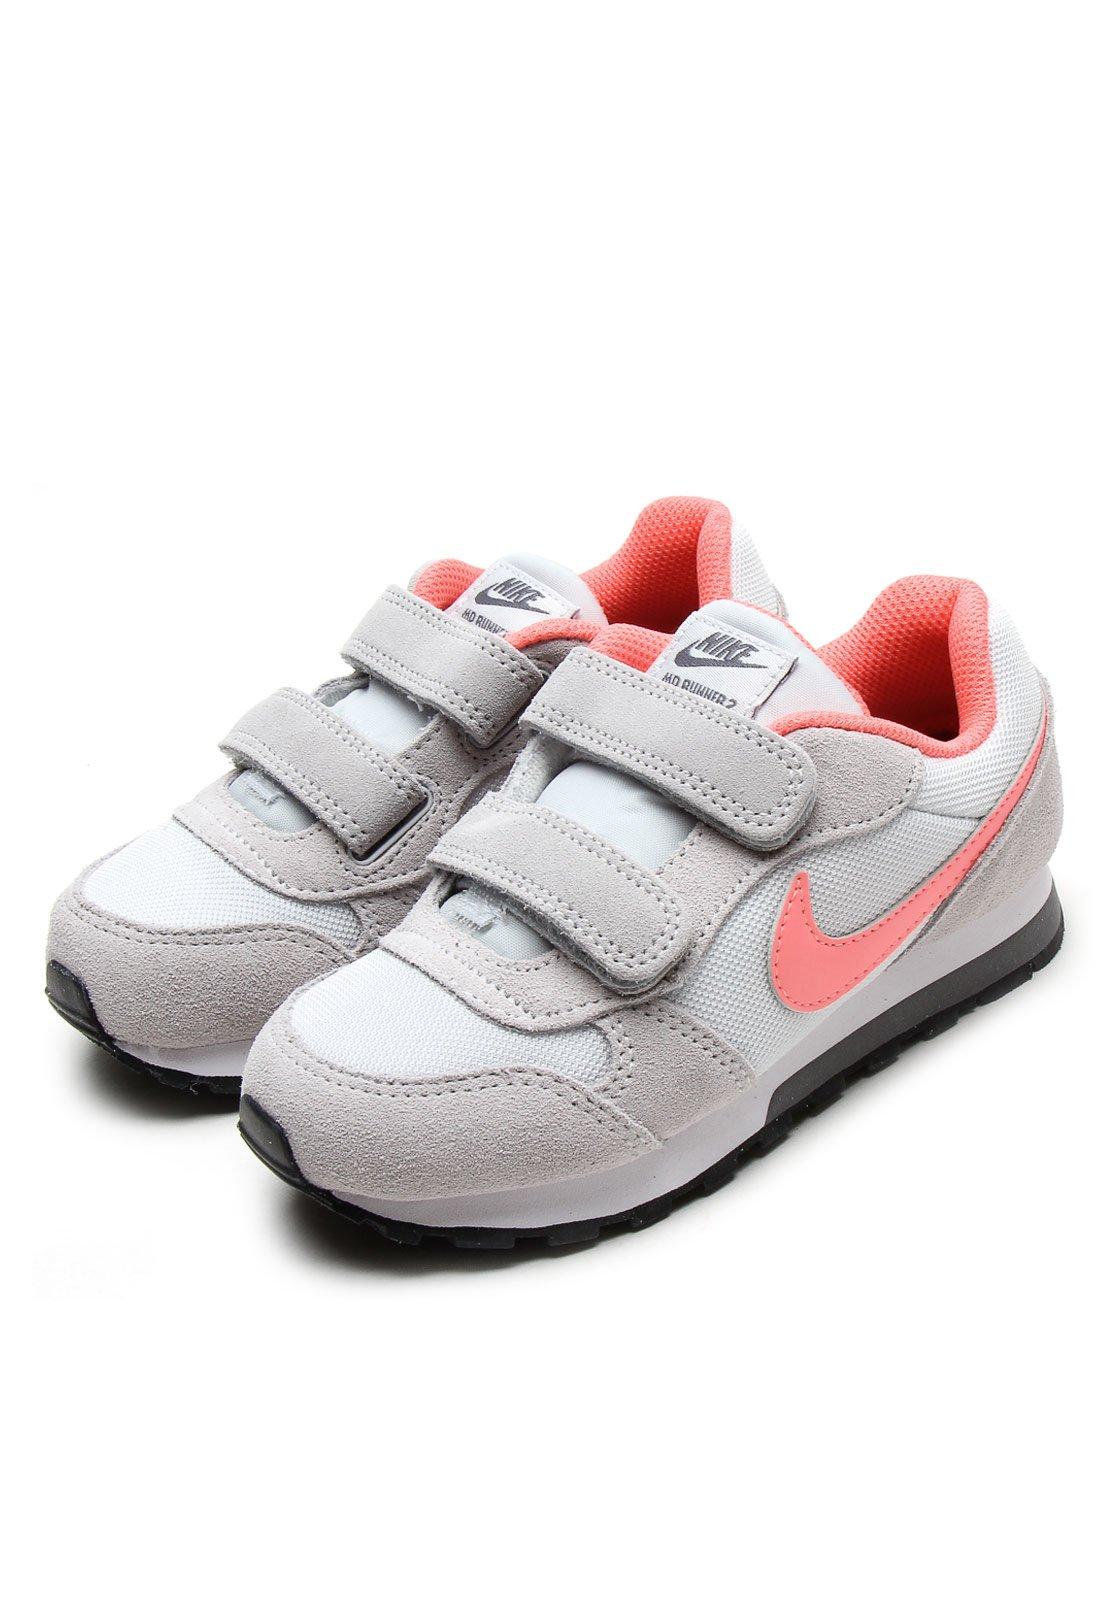 6c7b5fa2aa8 Tênis Nike MD Runner 2 (PS) Cinza Rosa - Compre Agora